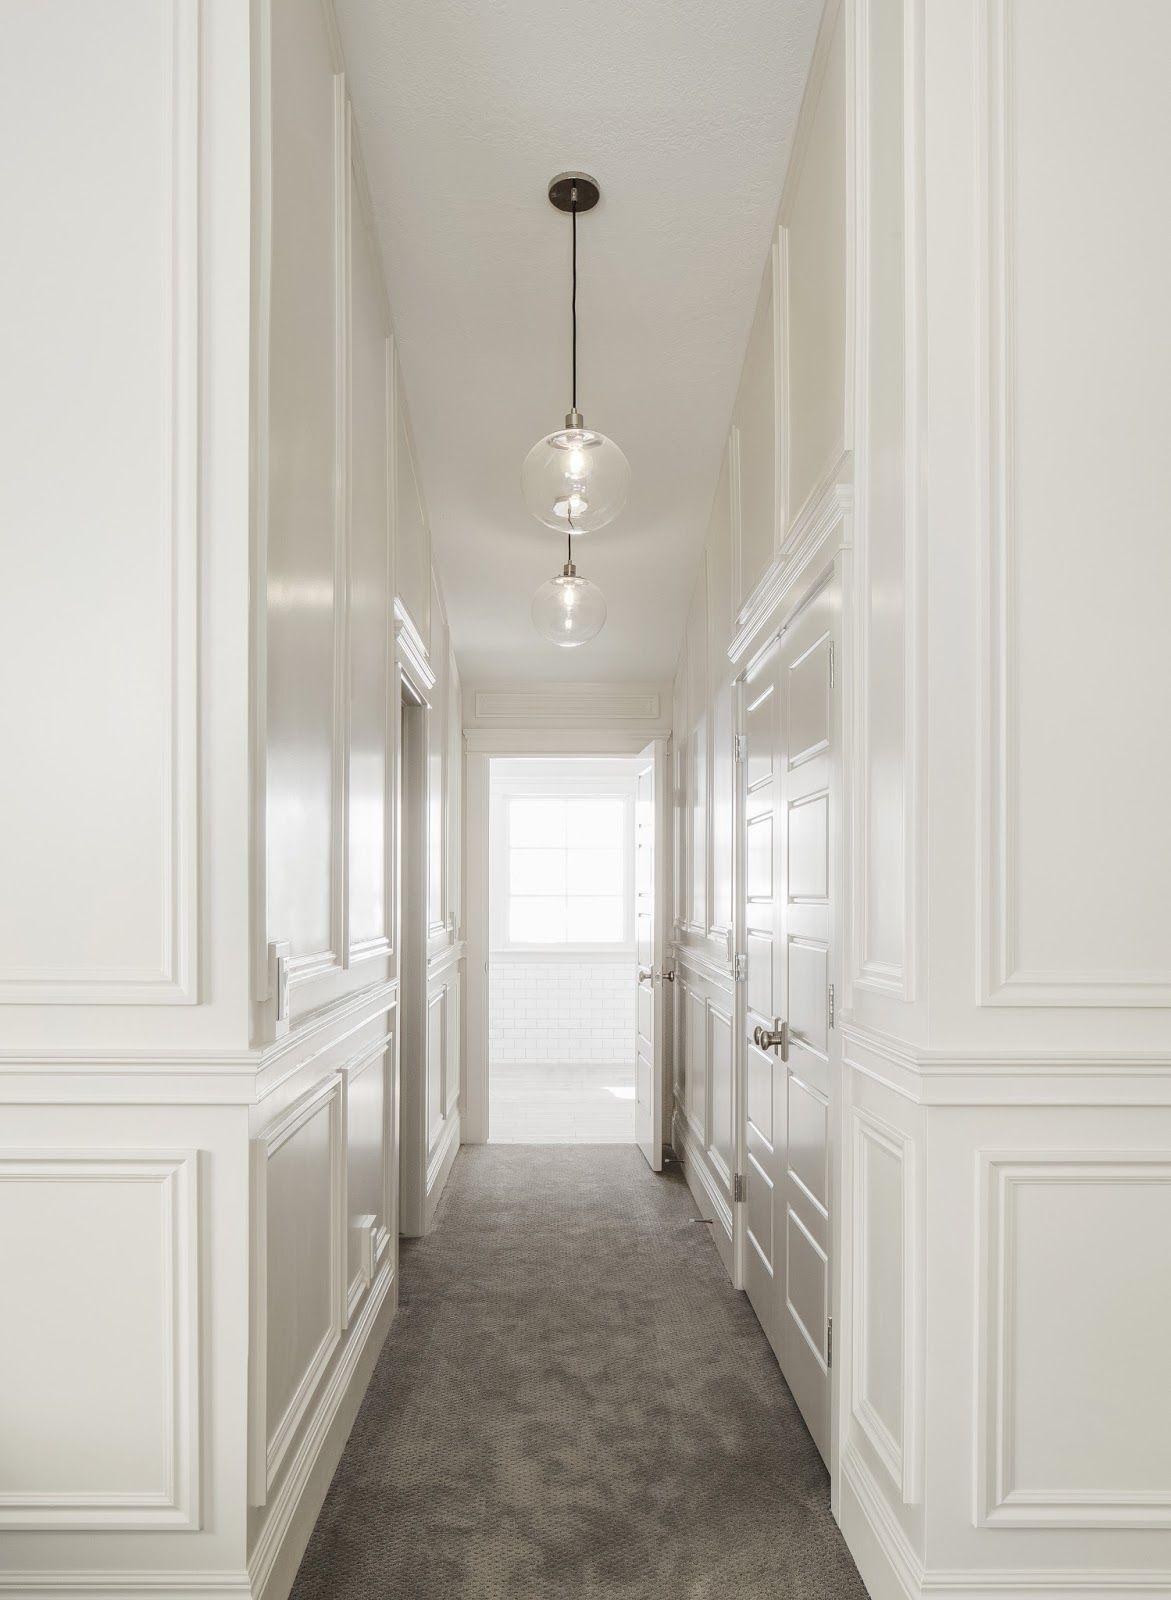 Pin by Brenda Goss Design on La Maison 2 | Pinterest | Moldings ...